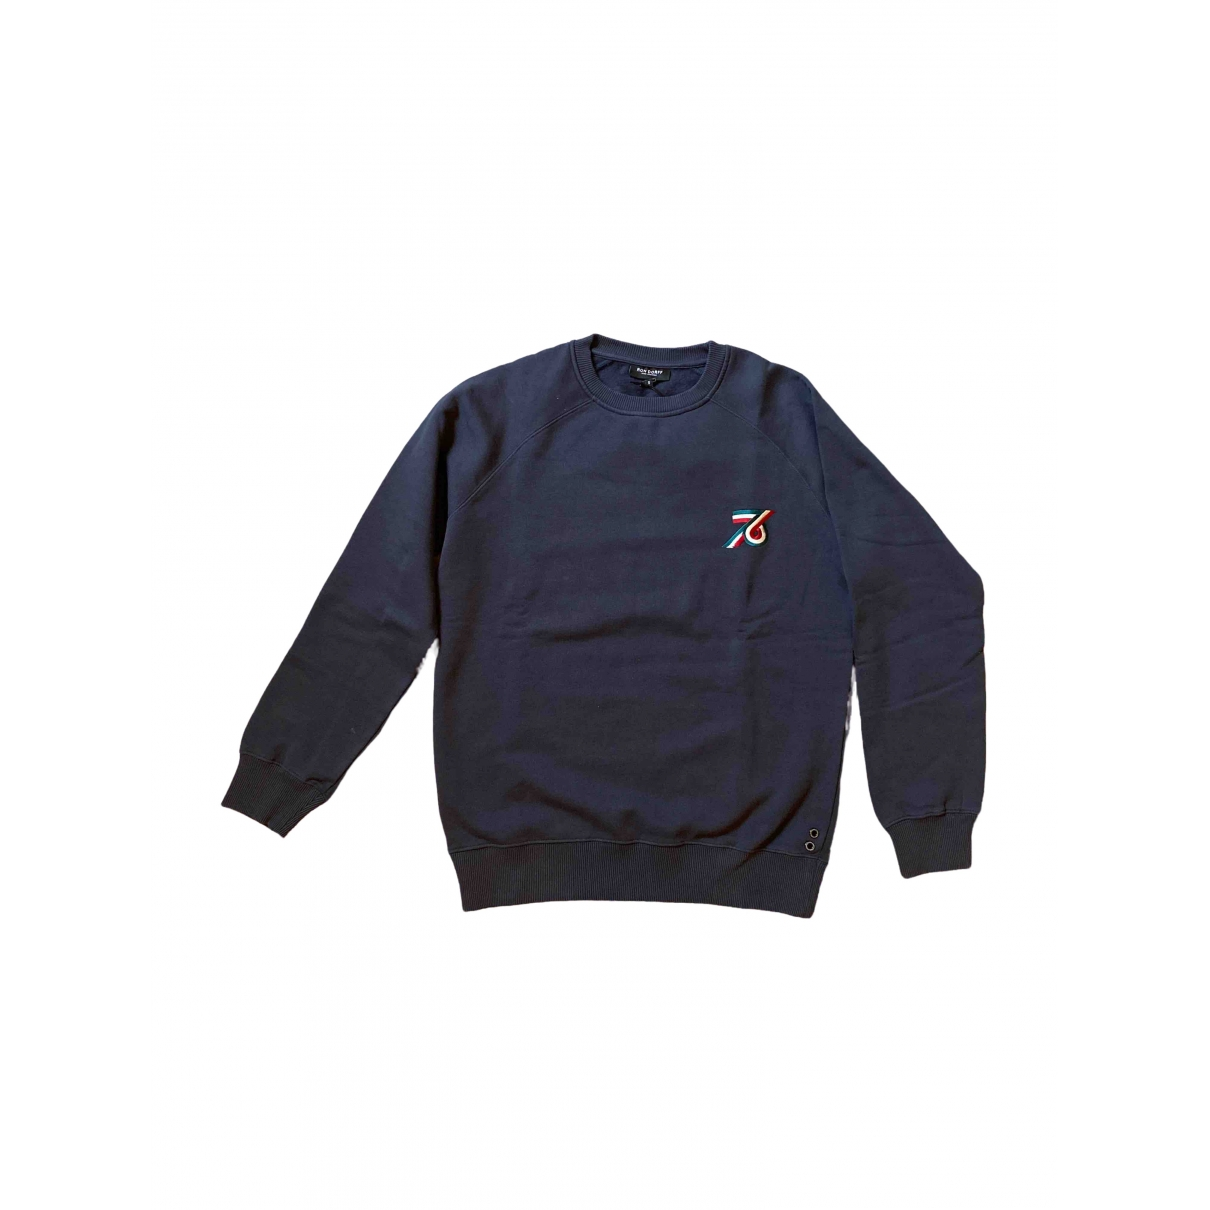 Ron Dorff \N Navy Cotton Knitwear & Sweatshirts for Men S International